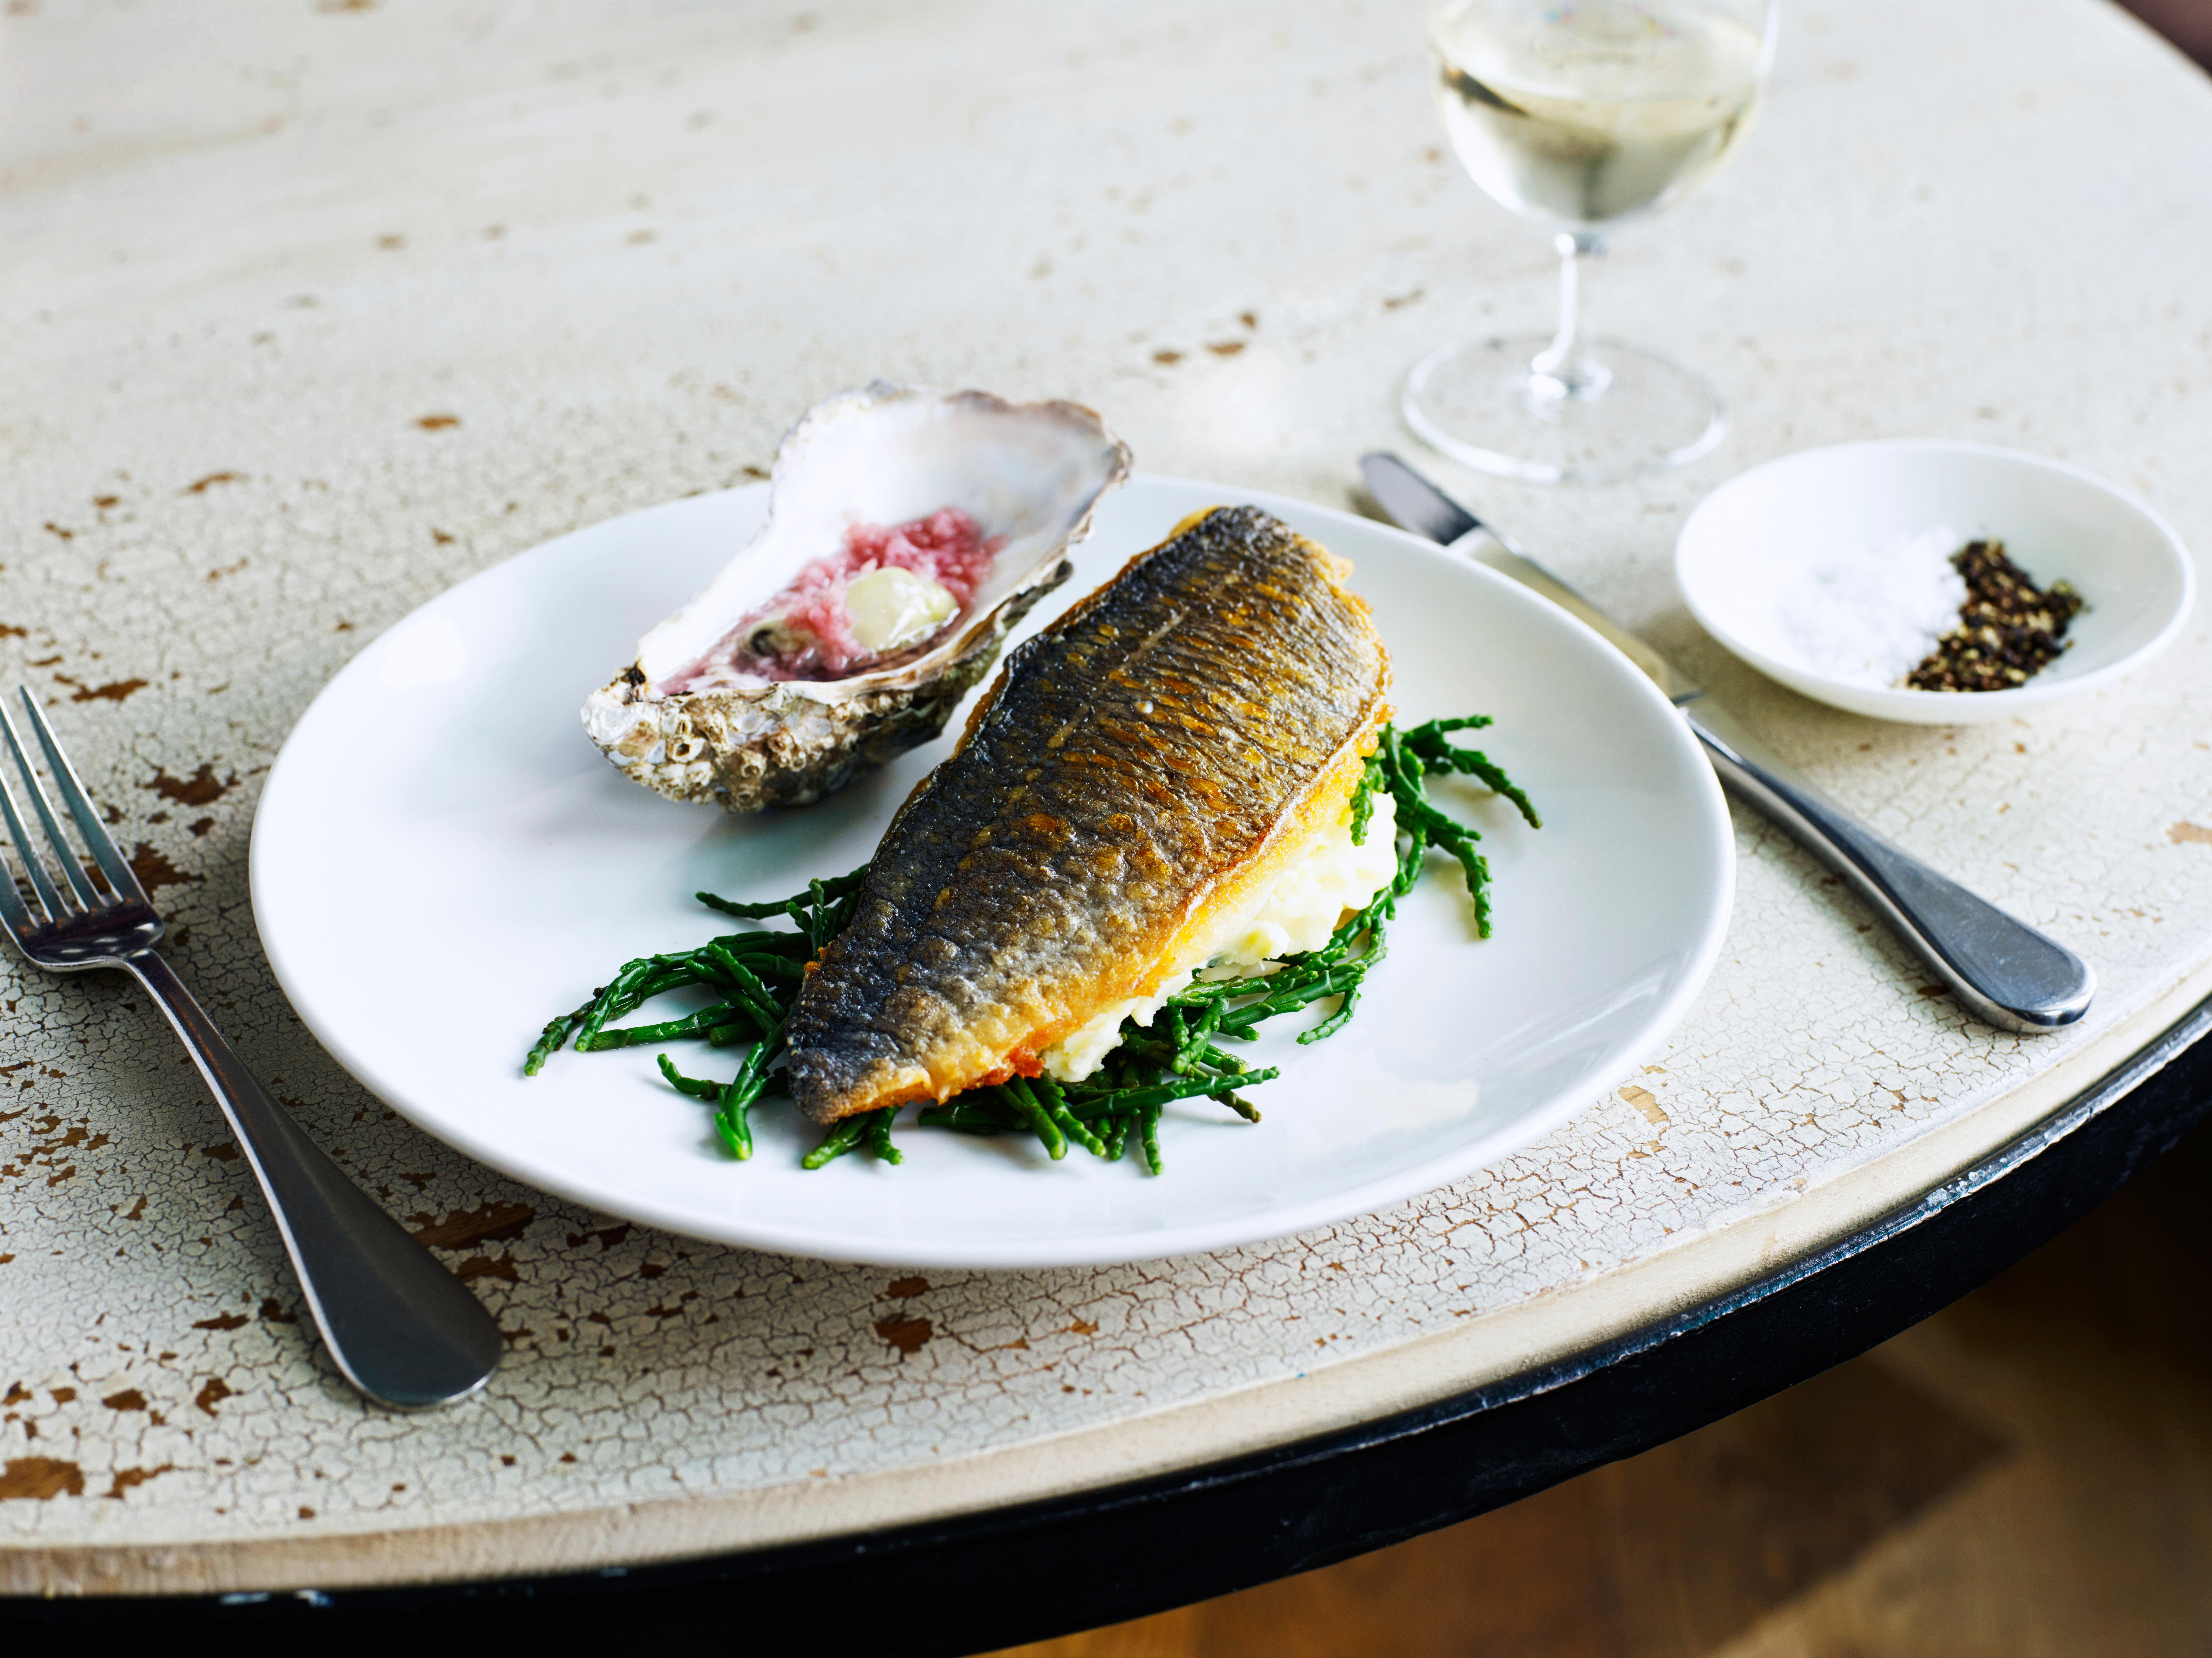 Dining Drink Eat plate food fish sardine forage fish cuisine restaurant piece de resistance